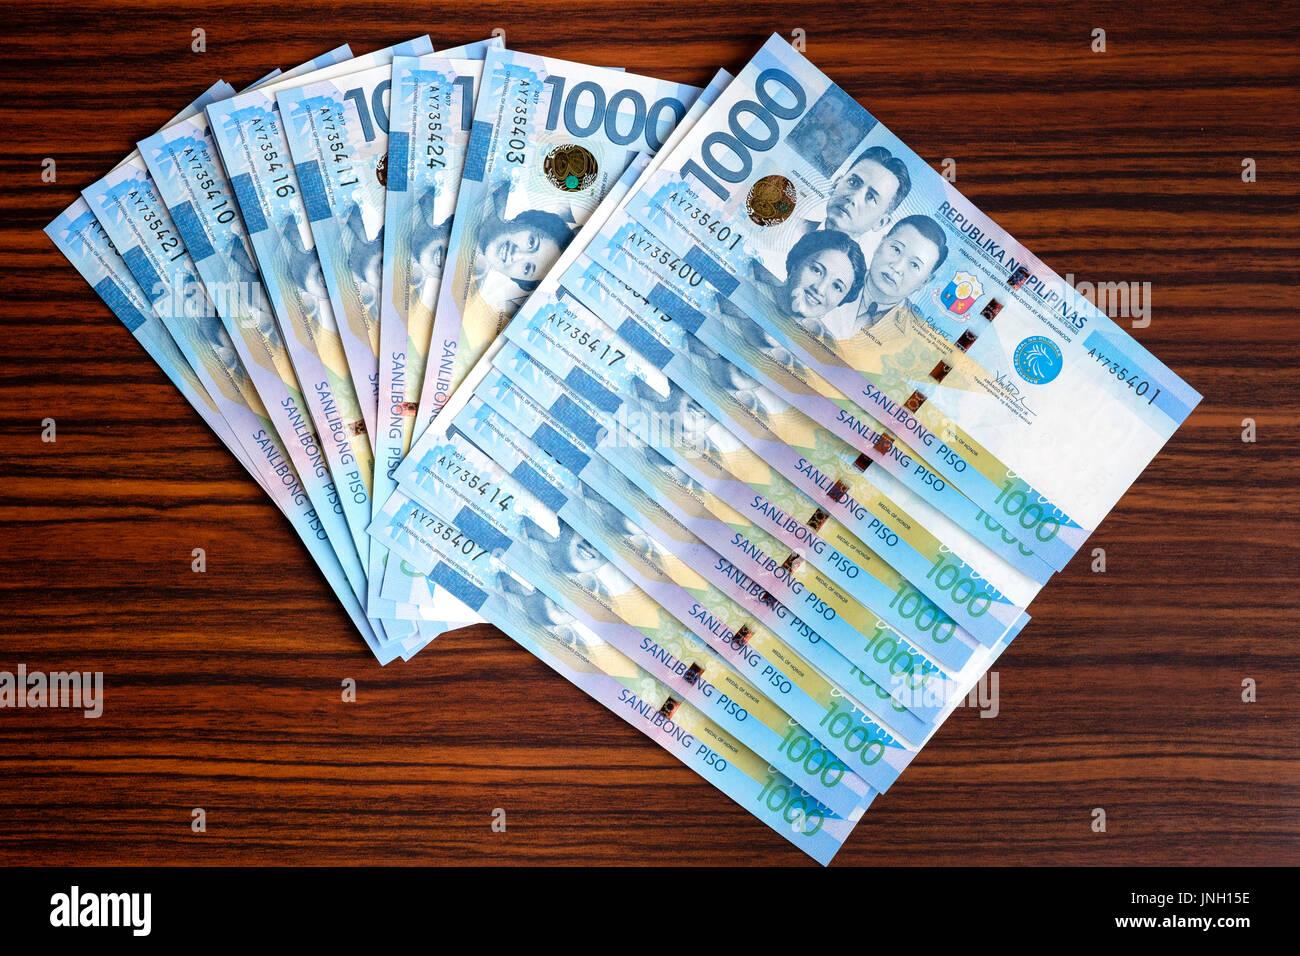 Philippines Pesos Stock Photos & Philippines Pesos Stock Images - Alamy